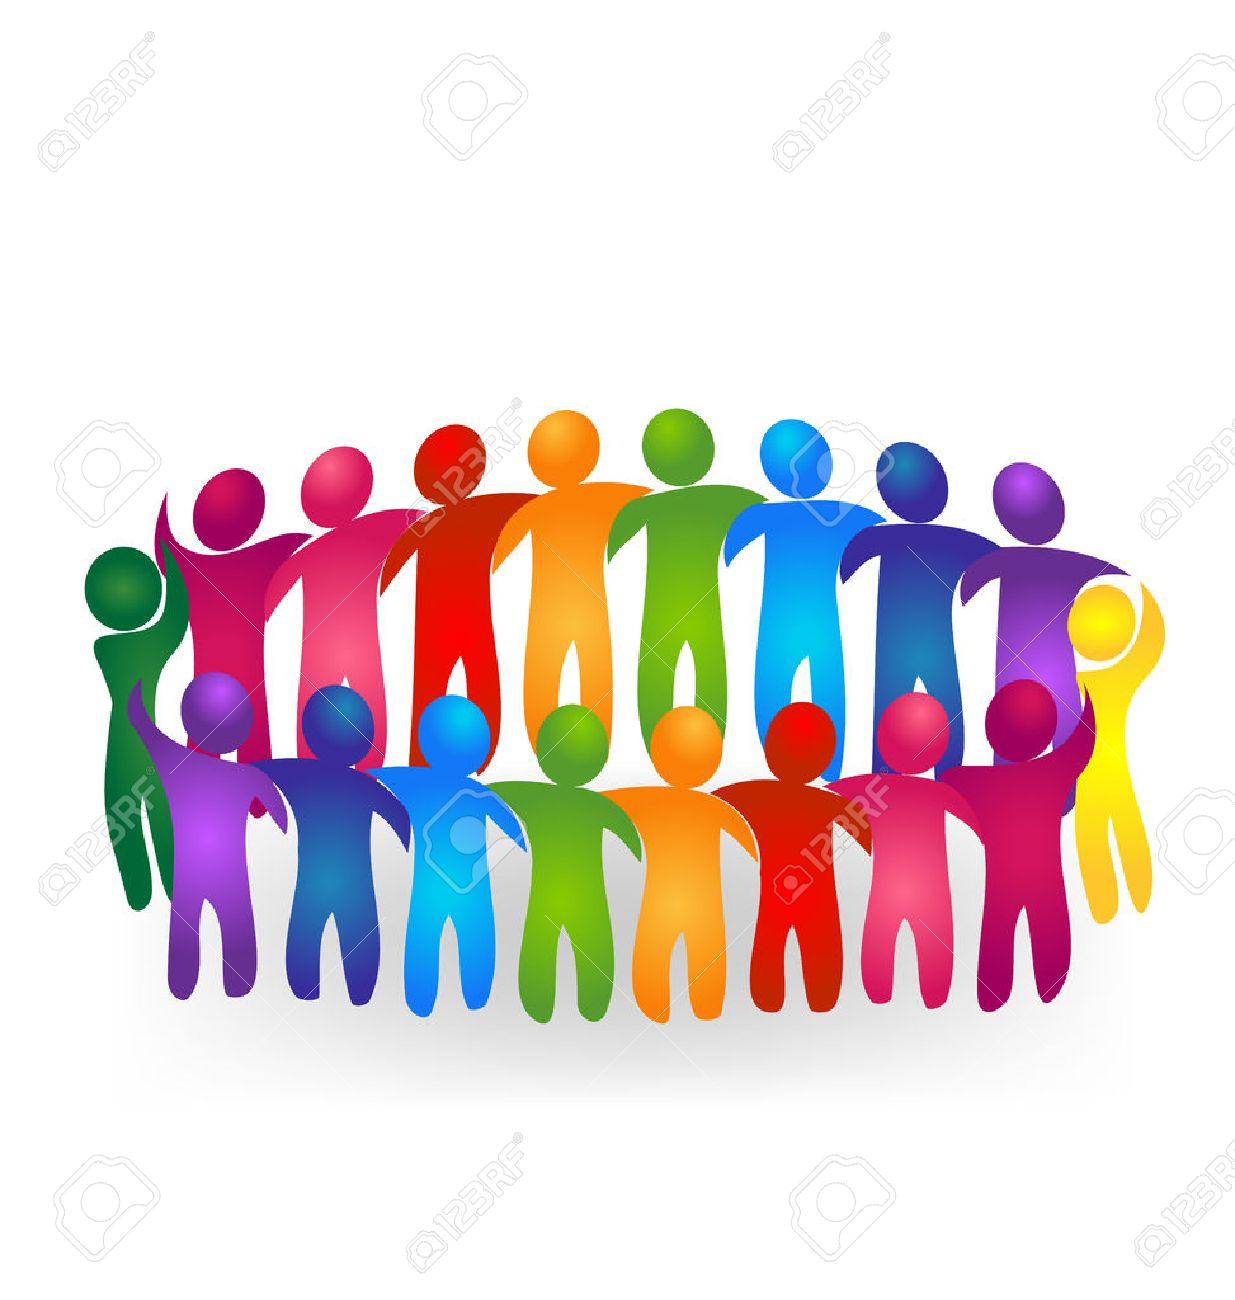 1235x1300 Vector Teamwork Meeting People Logo Royalty Free Cliparts, Vectors